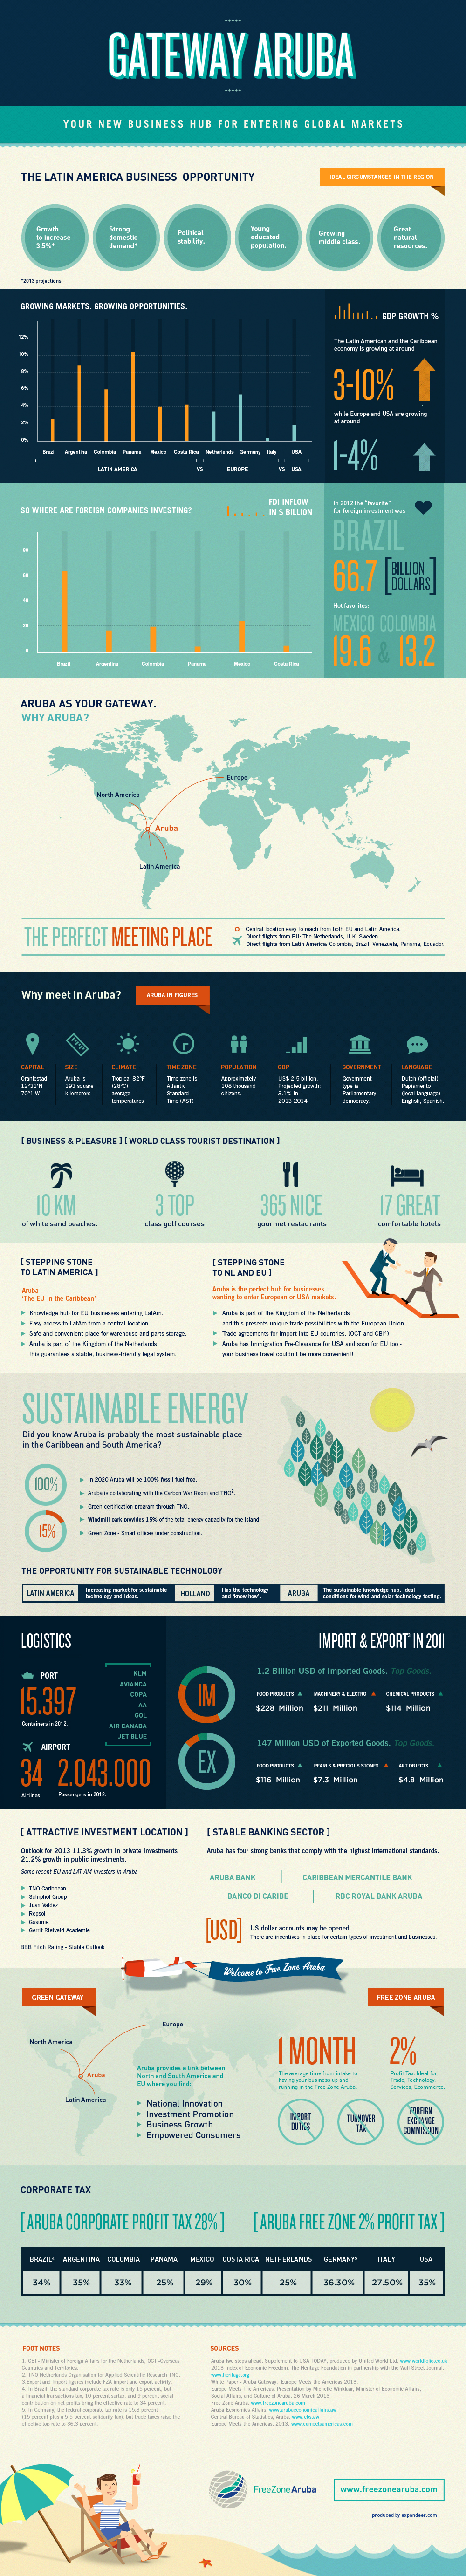 Gateway Aruba Infographic